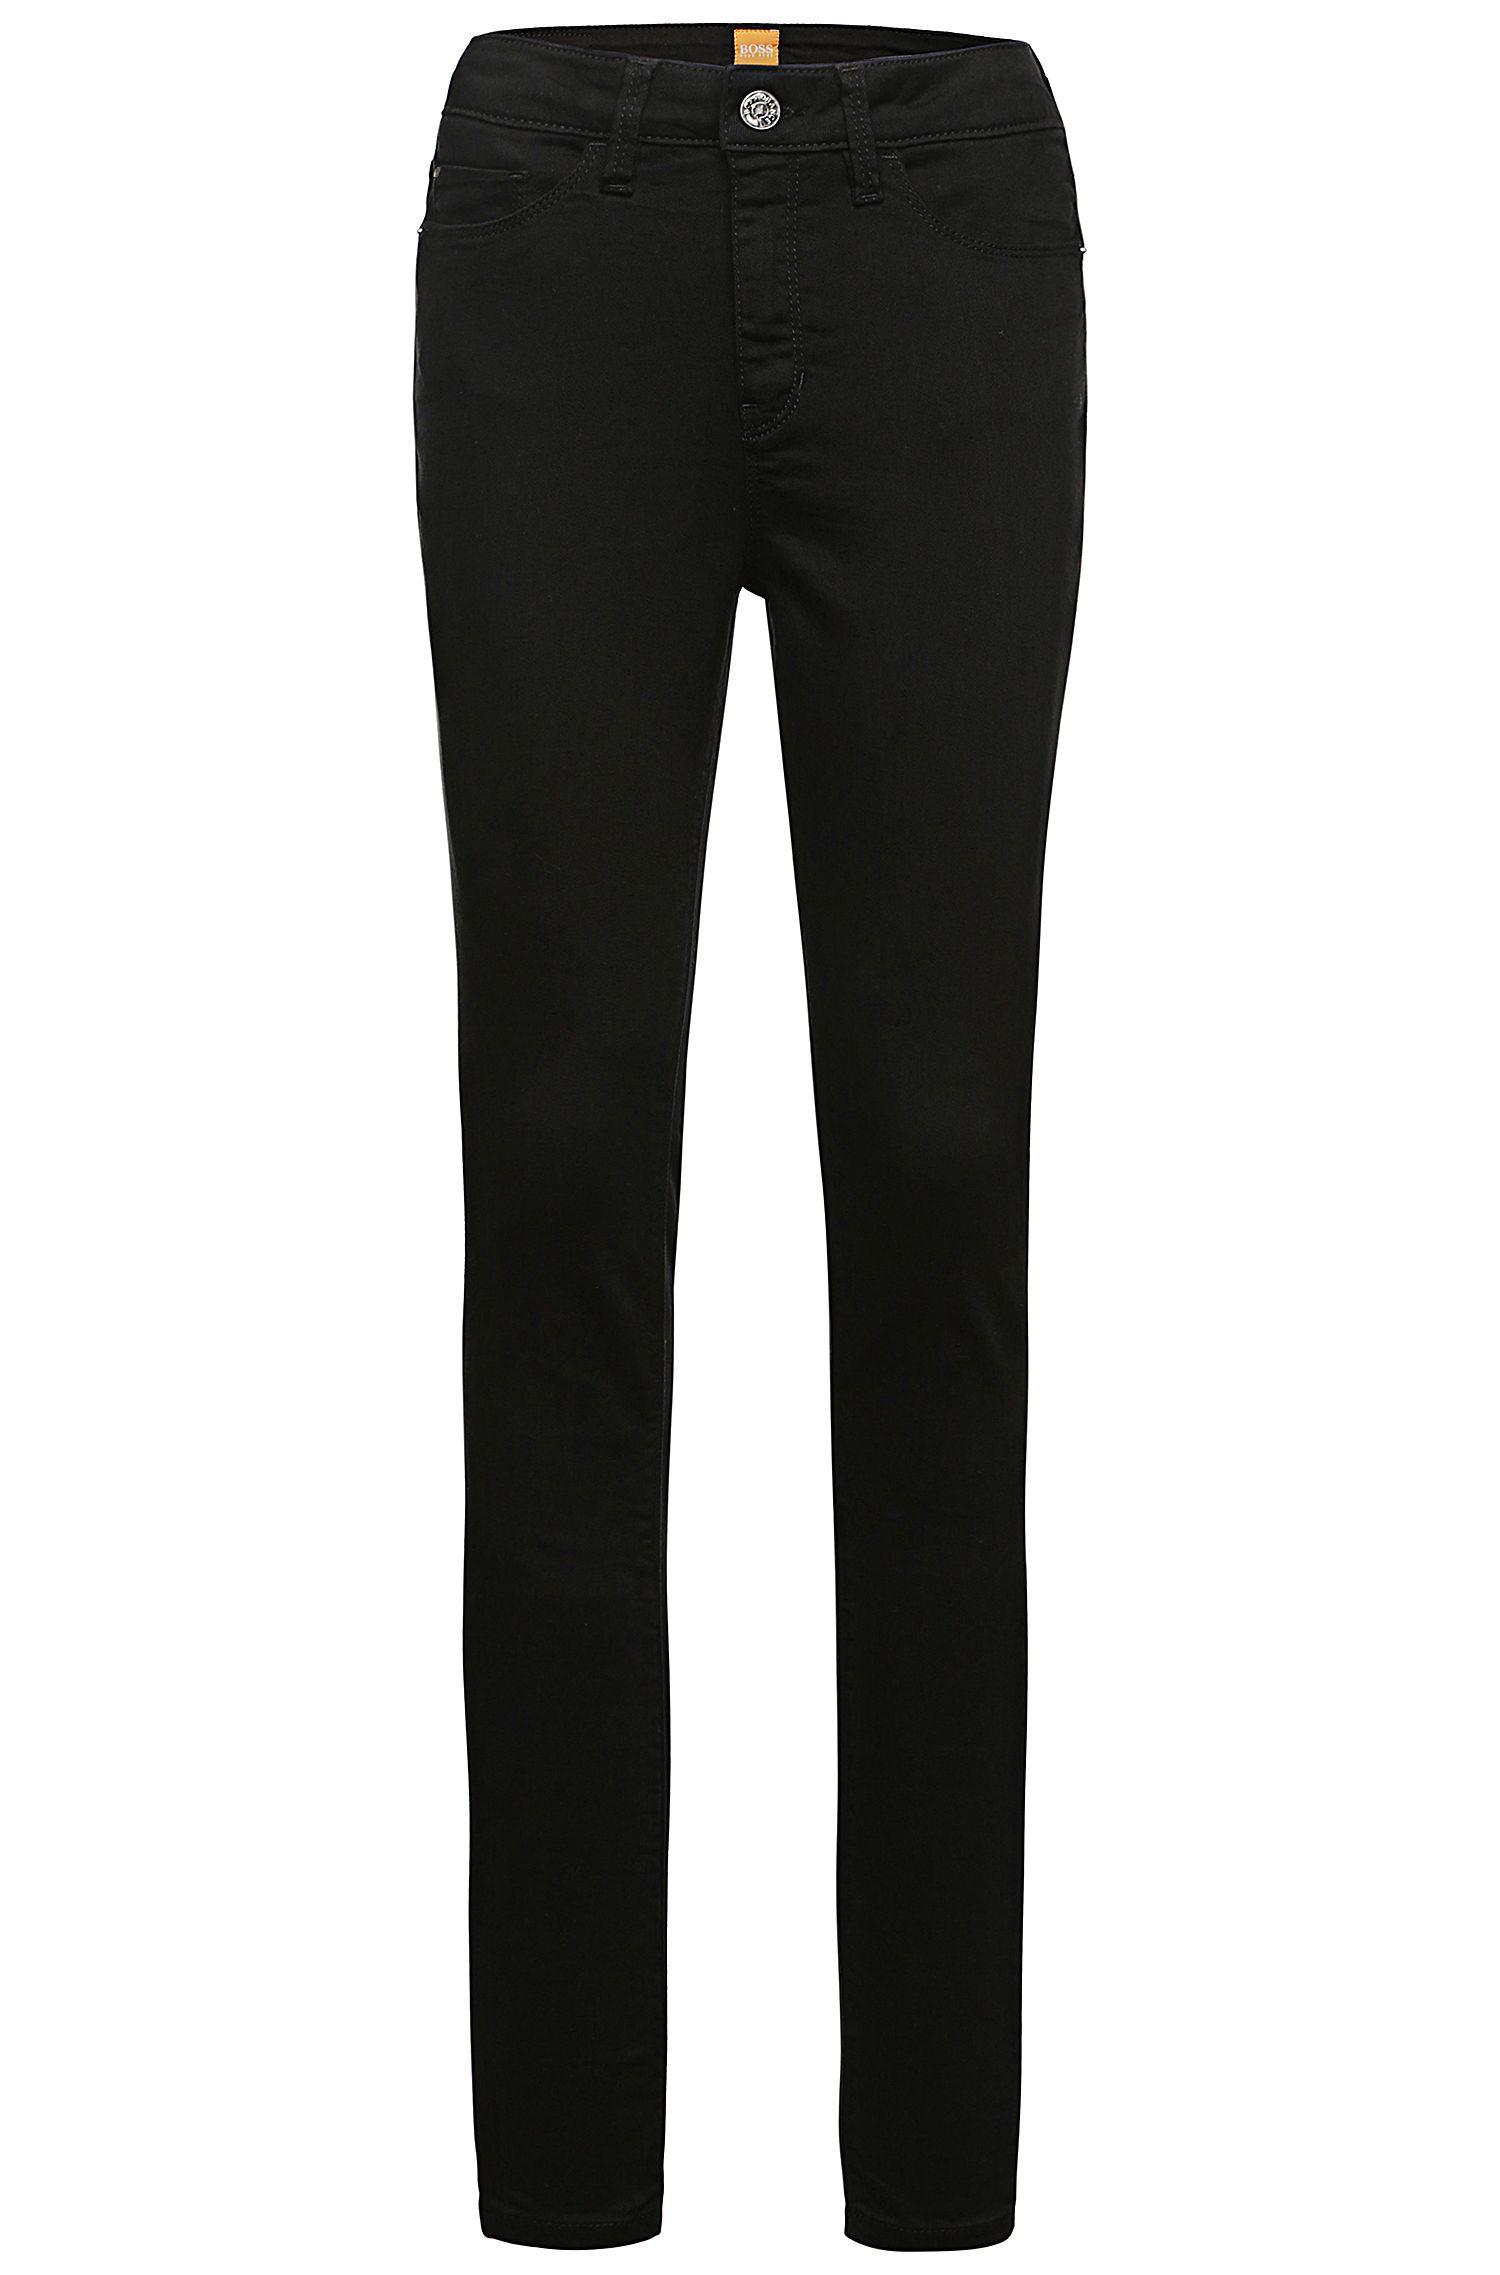 'Orange J' | Stretch Cotton Skinny Jeans